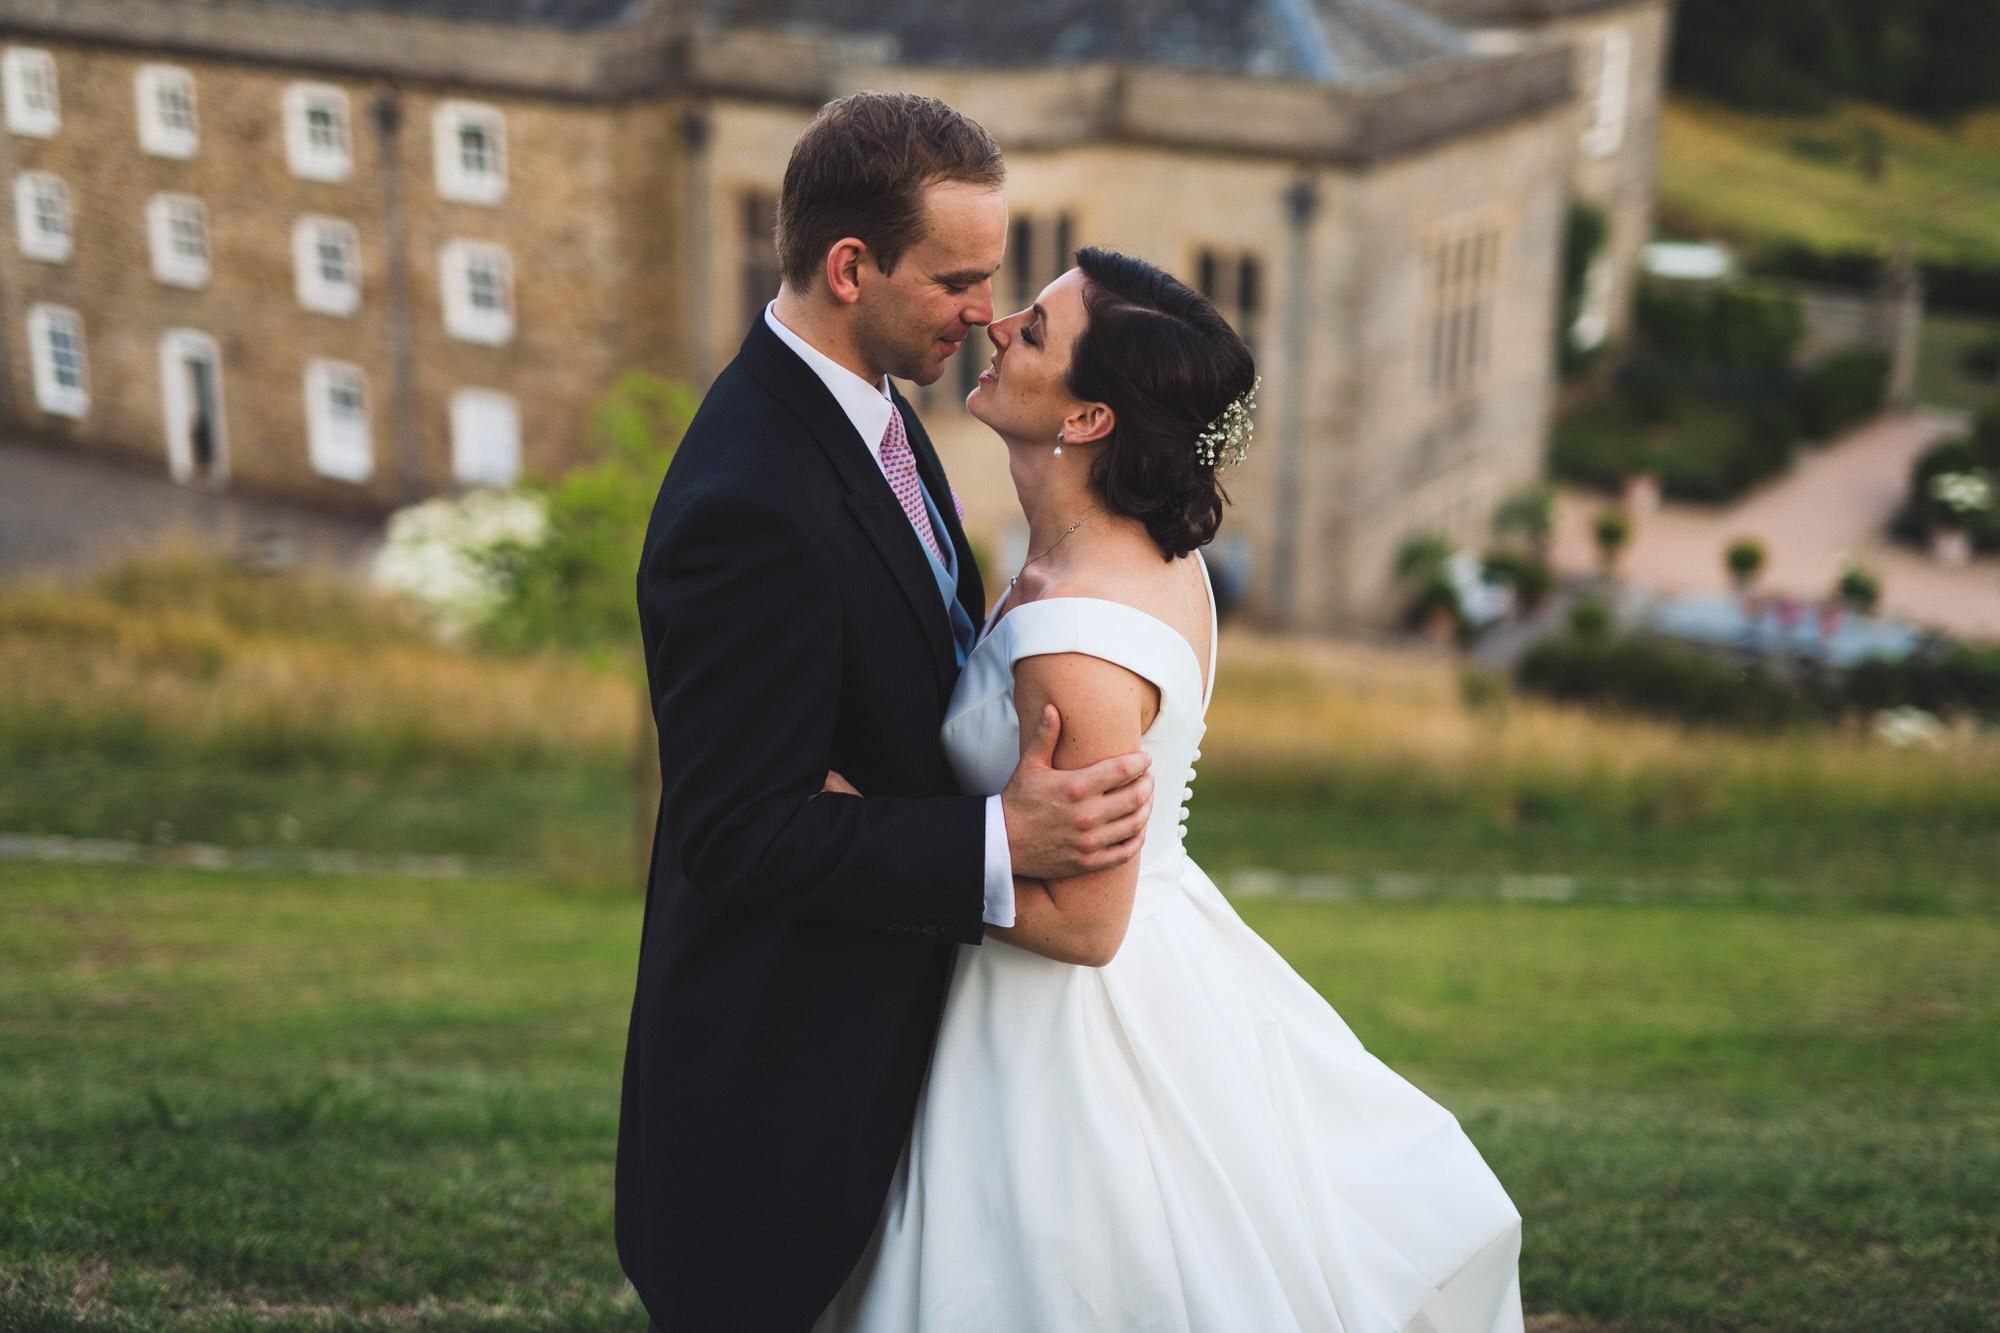 Shilstone wedding photographer 47